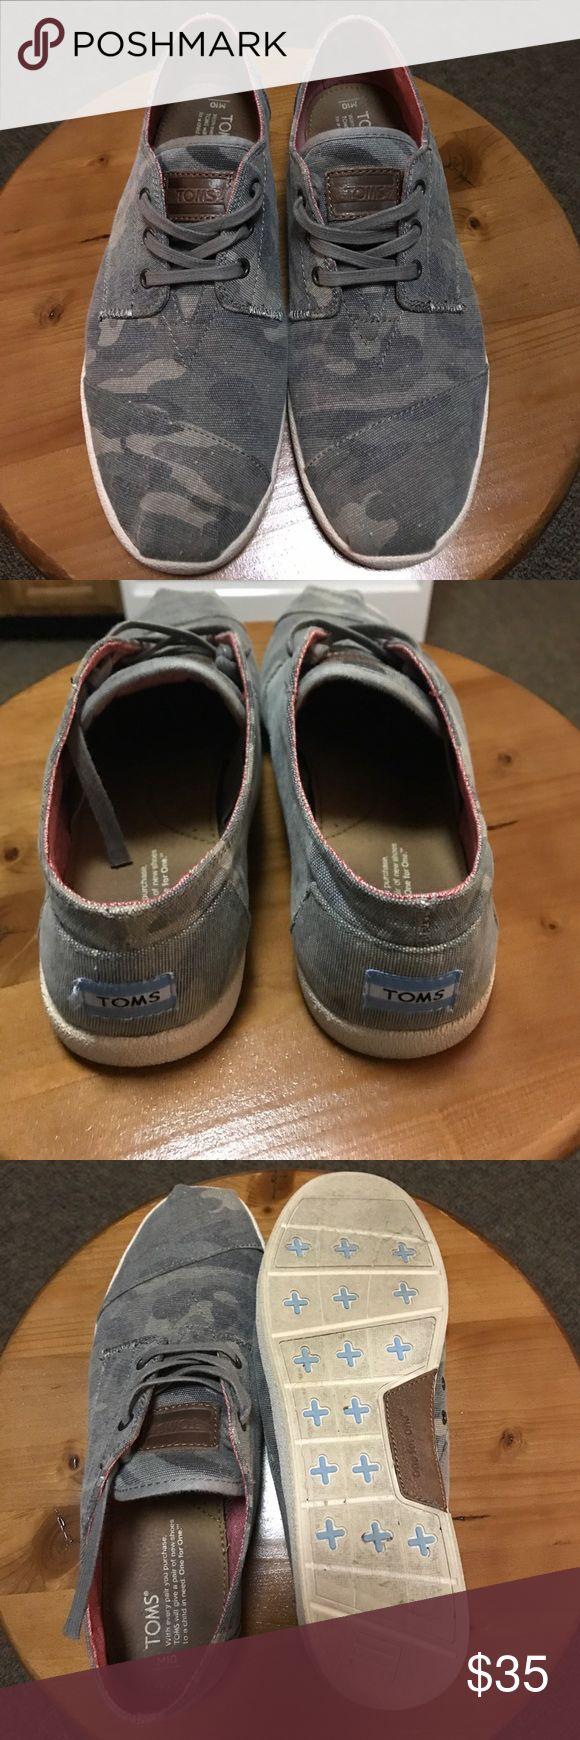 Men's size 10 camo Toms Men's size ten camo  Toms.  Excellent condition.  Worn a handful of times. TOMS Shoes Sneakers